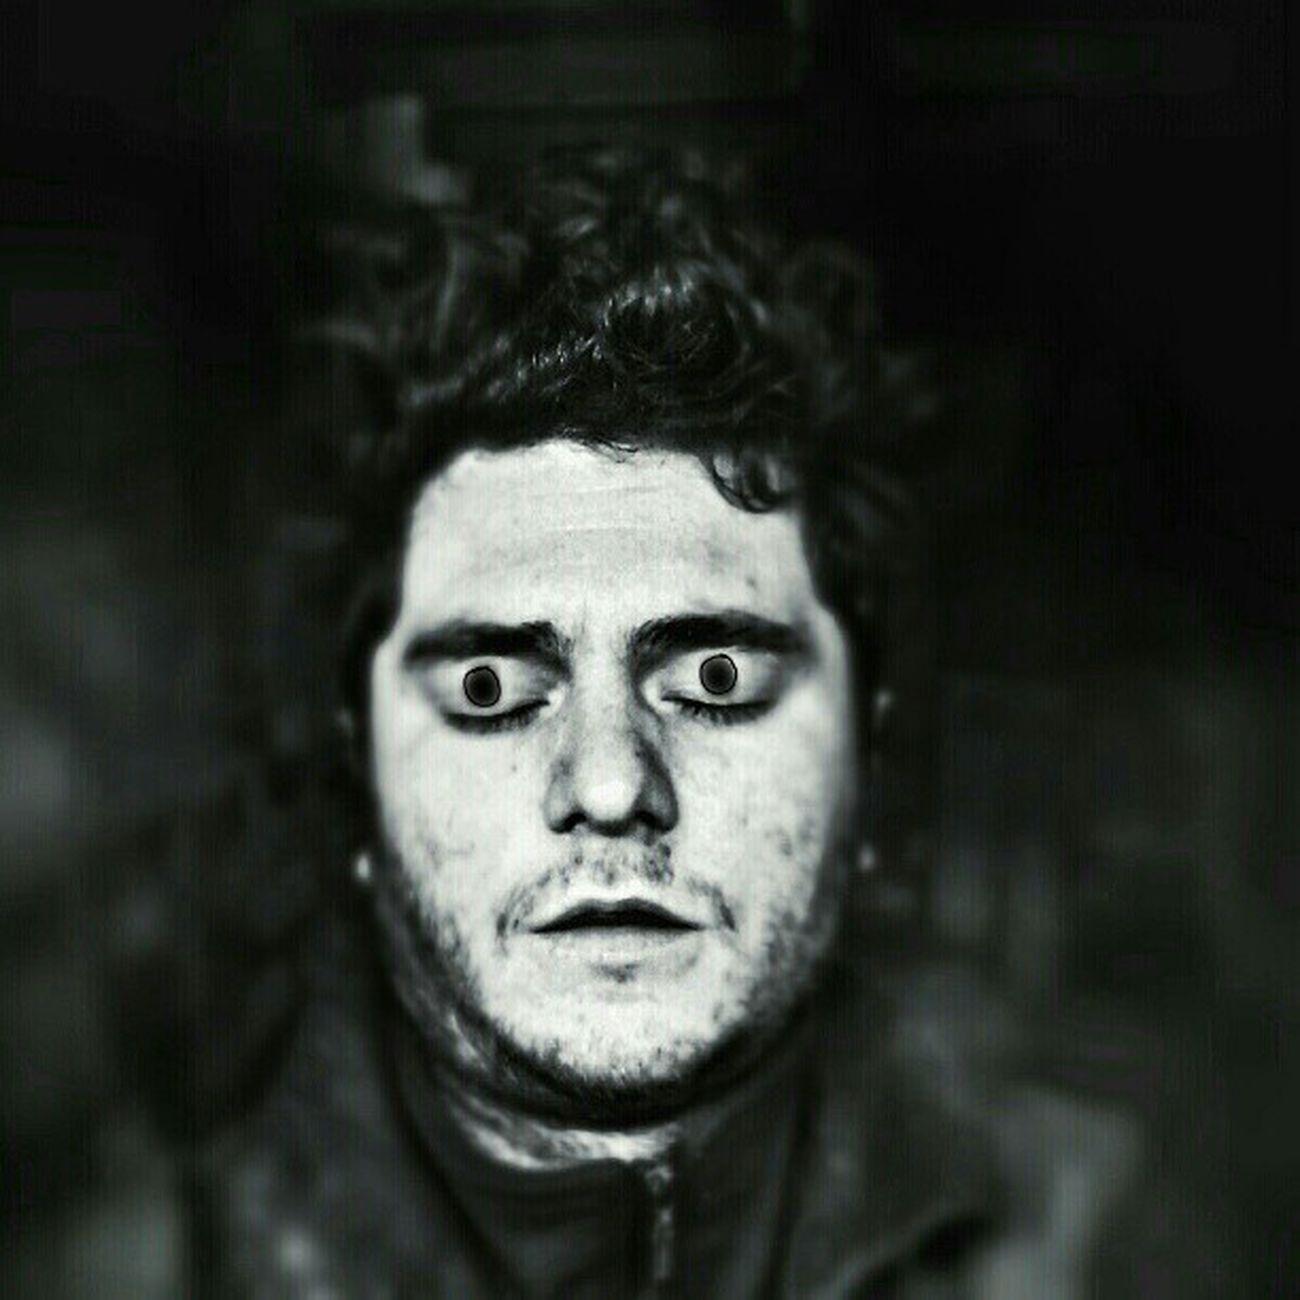 sălfportret insomniac Localsmd Mording2013 самострел портрет я